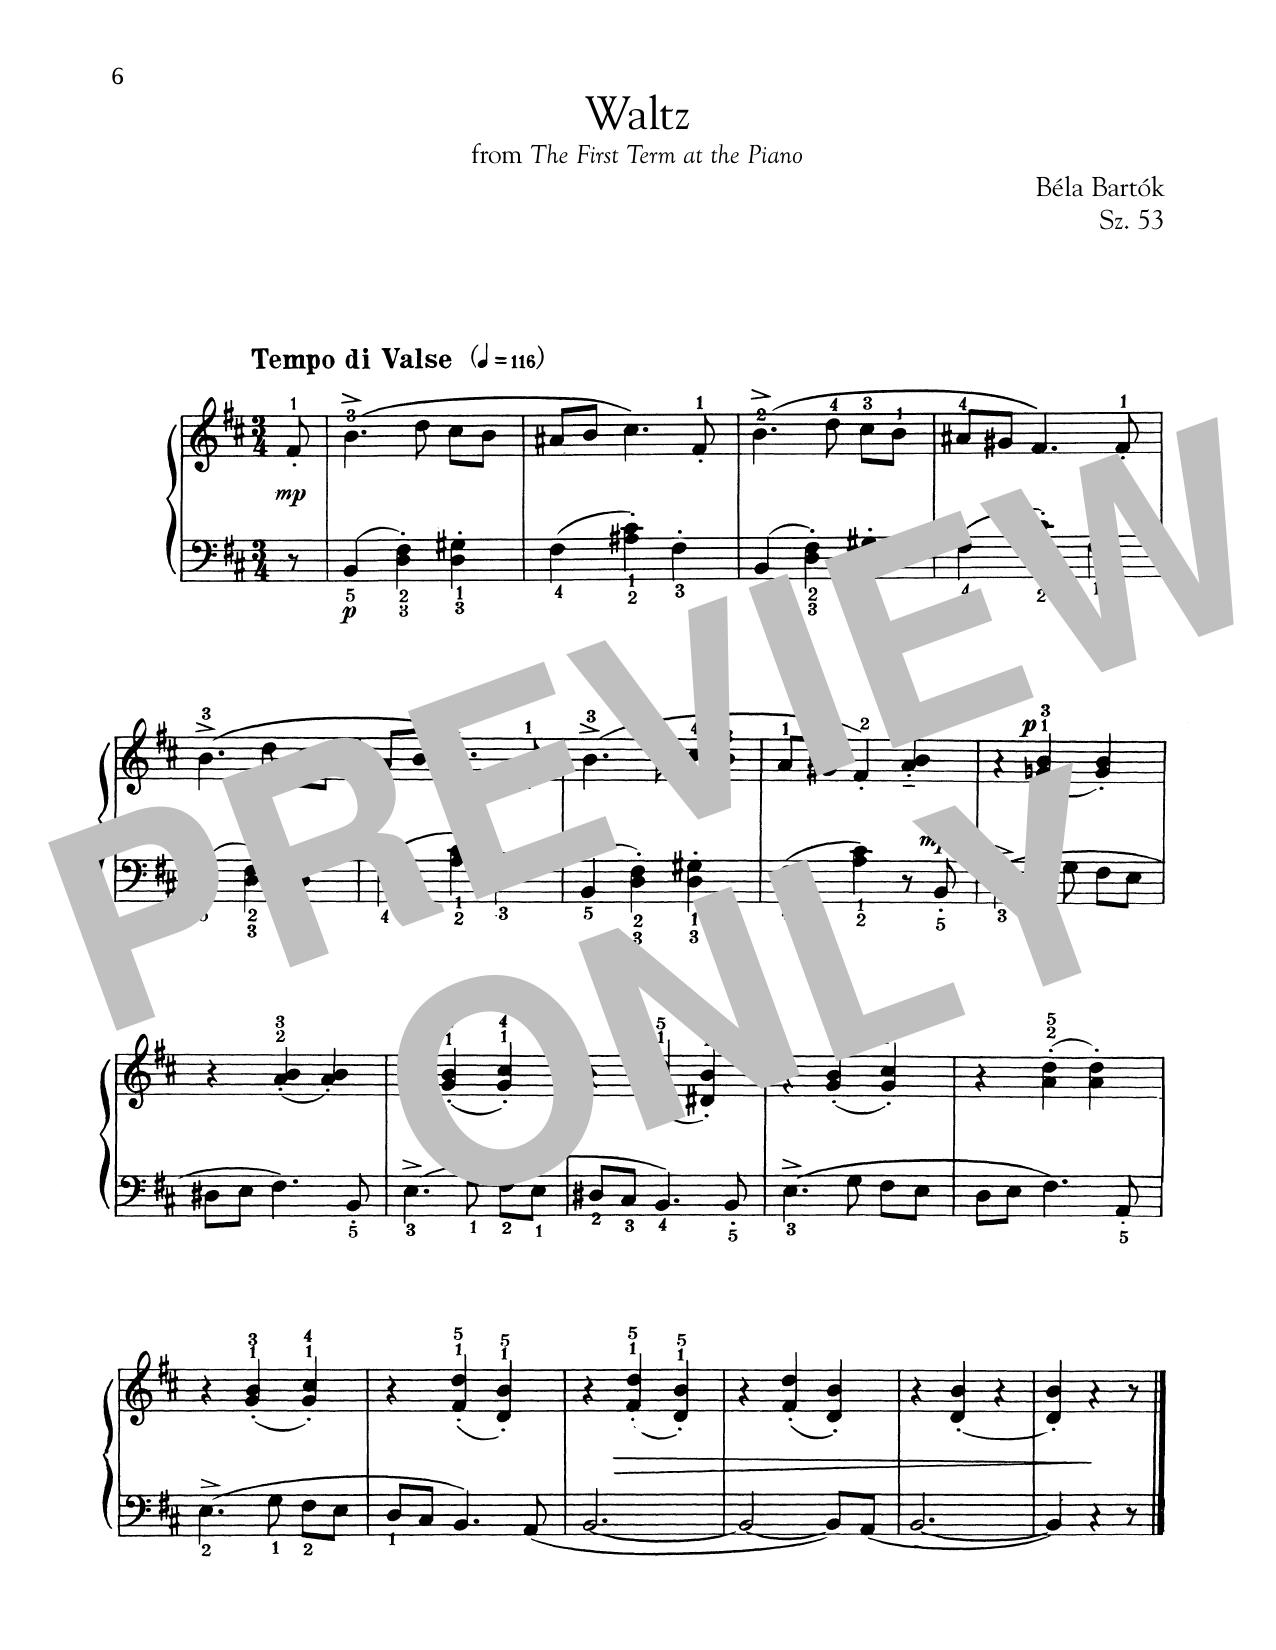 Bela Bartok Waltz sheet music notes and chords